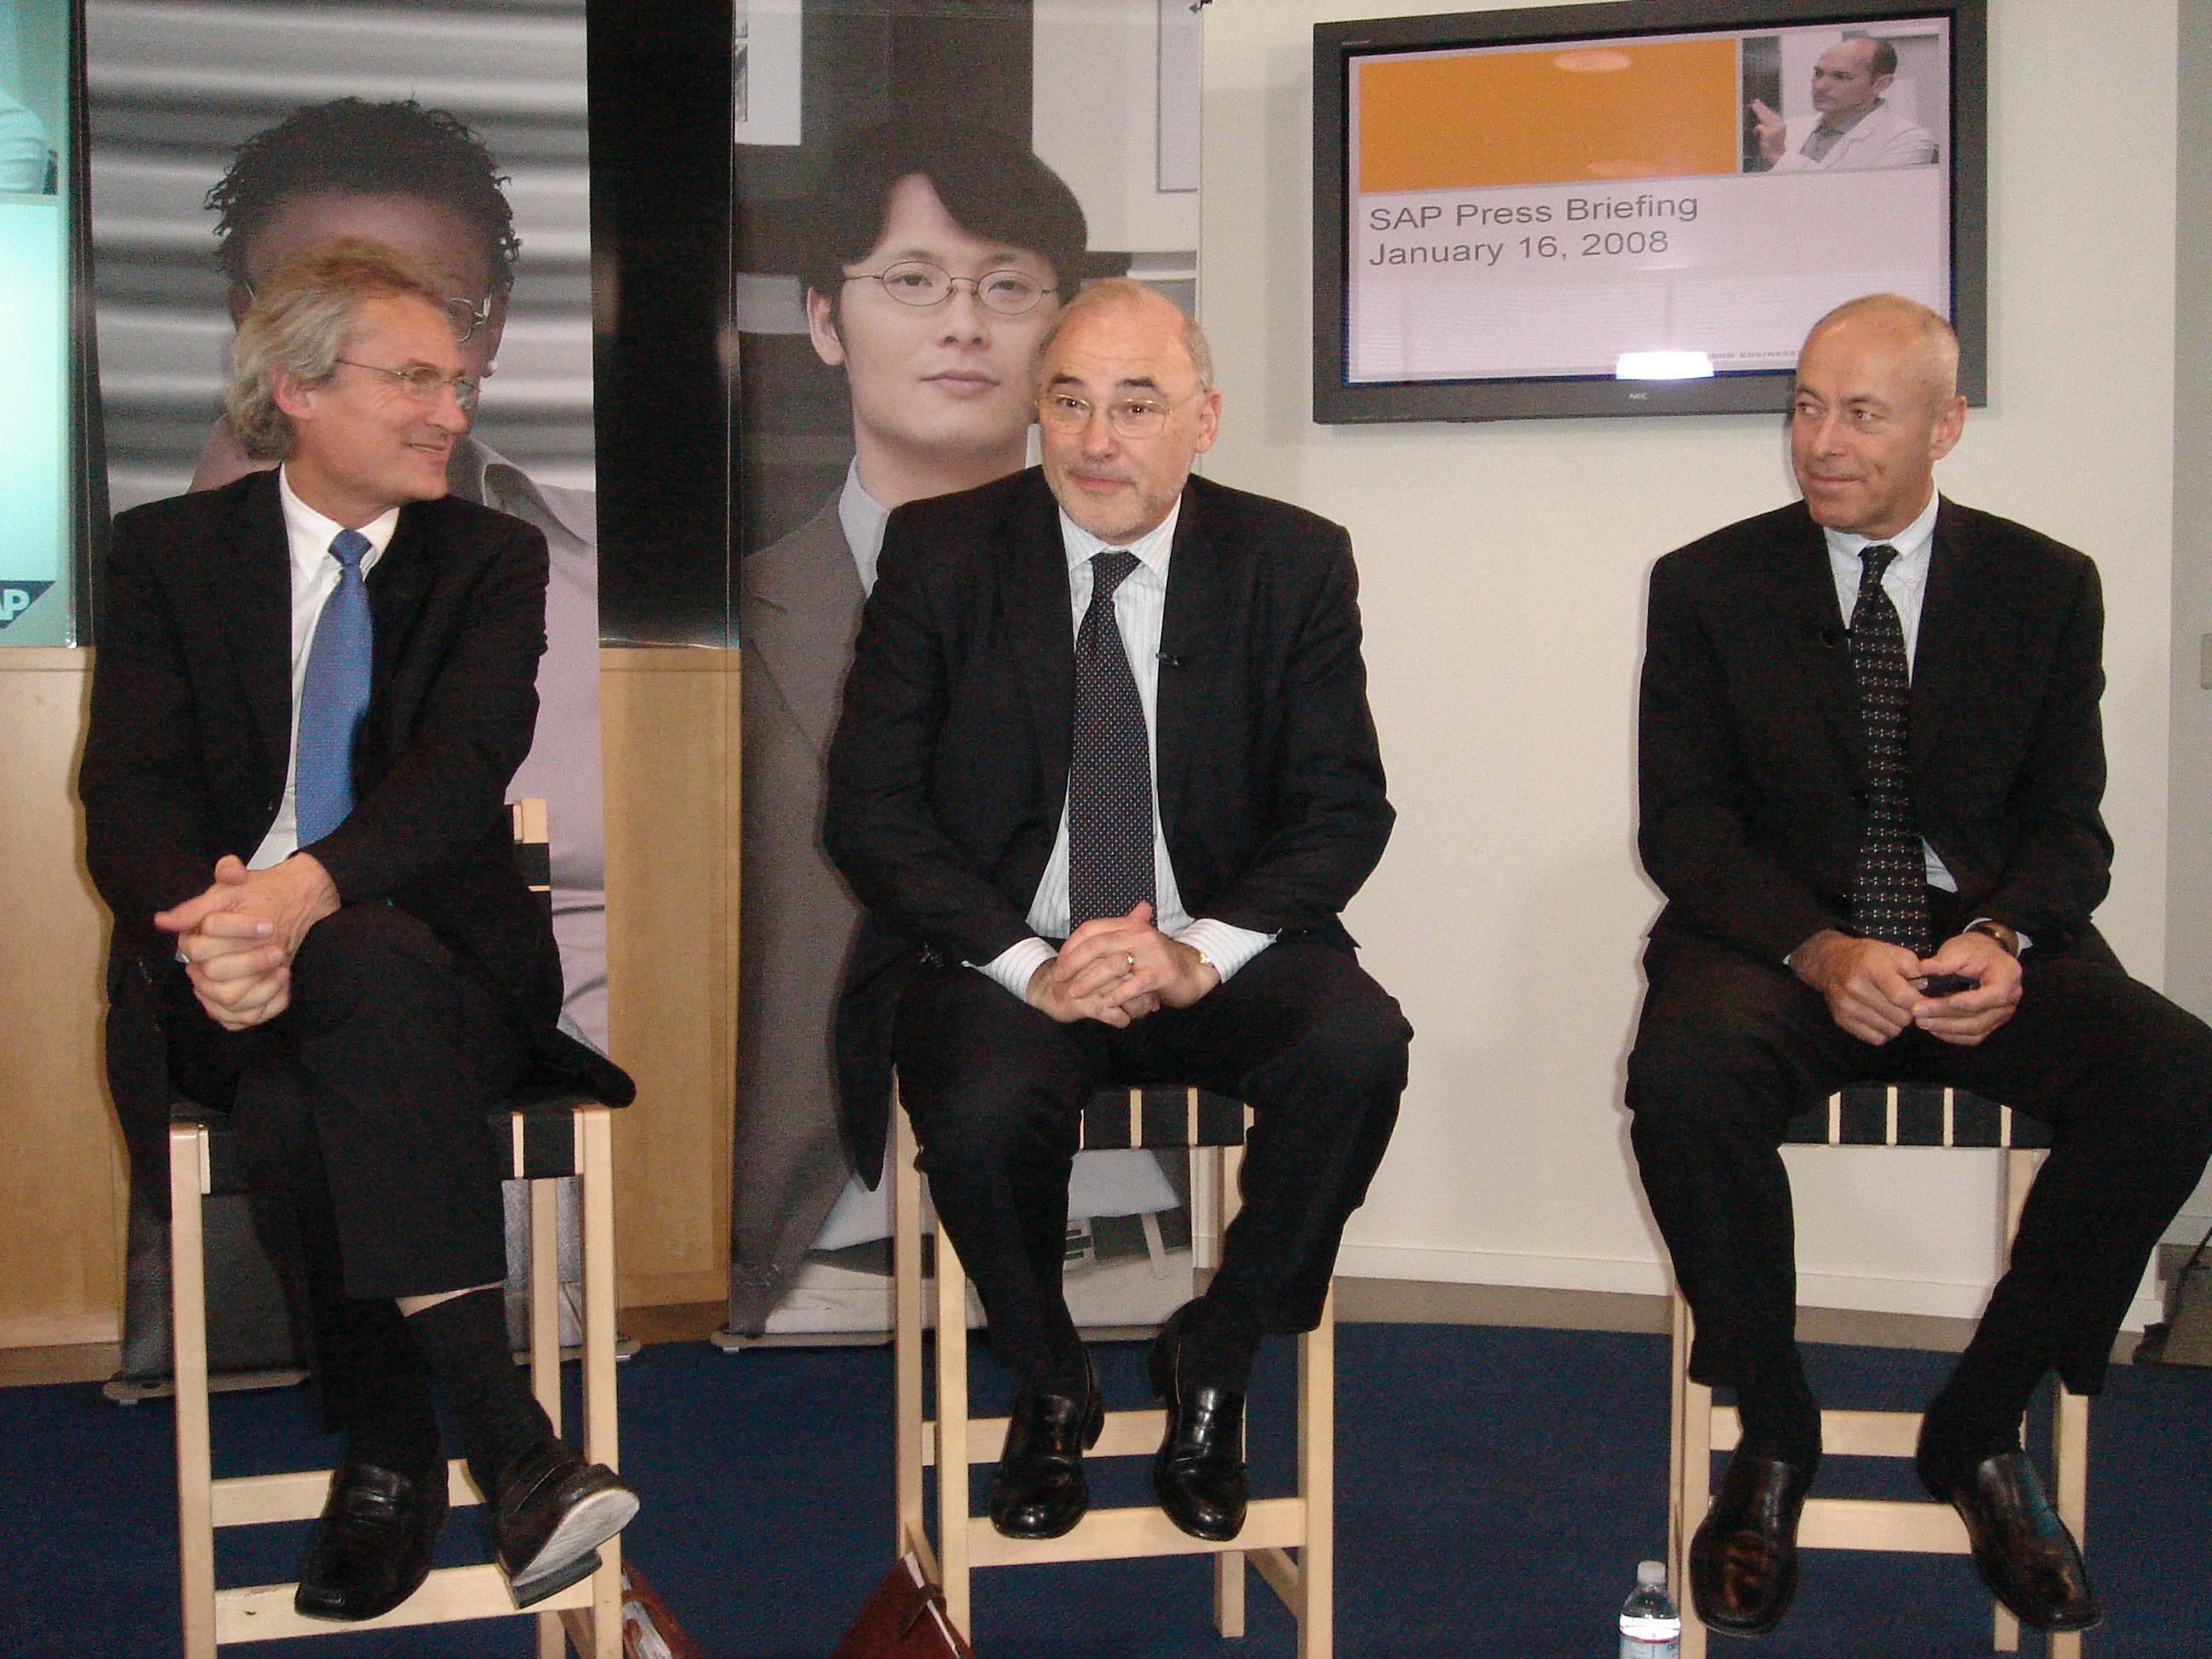 Conferencia de prensa SAP